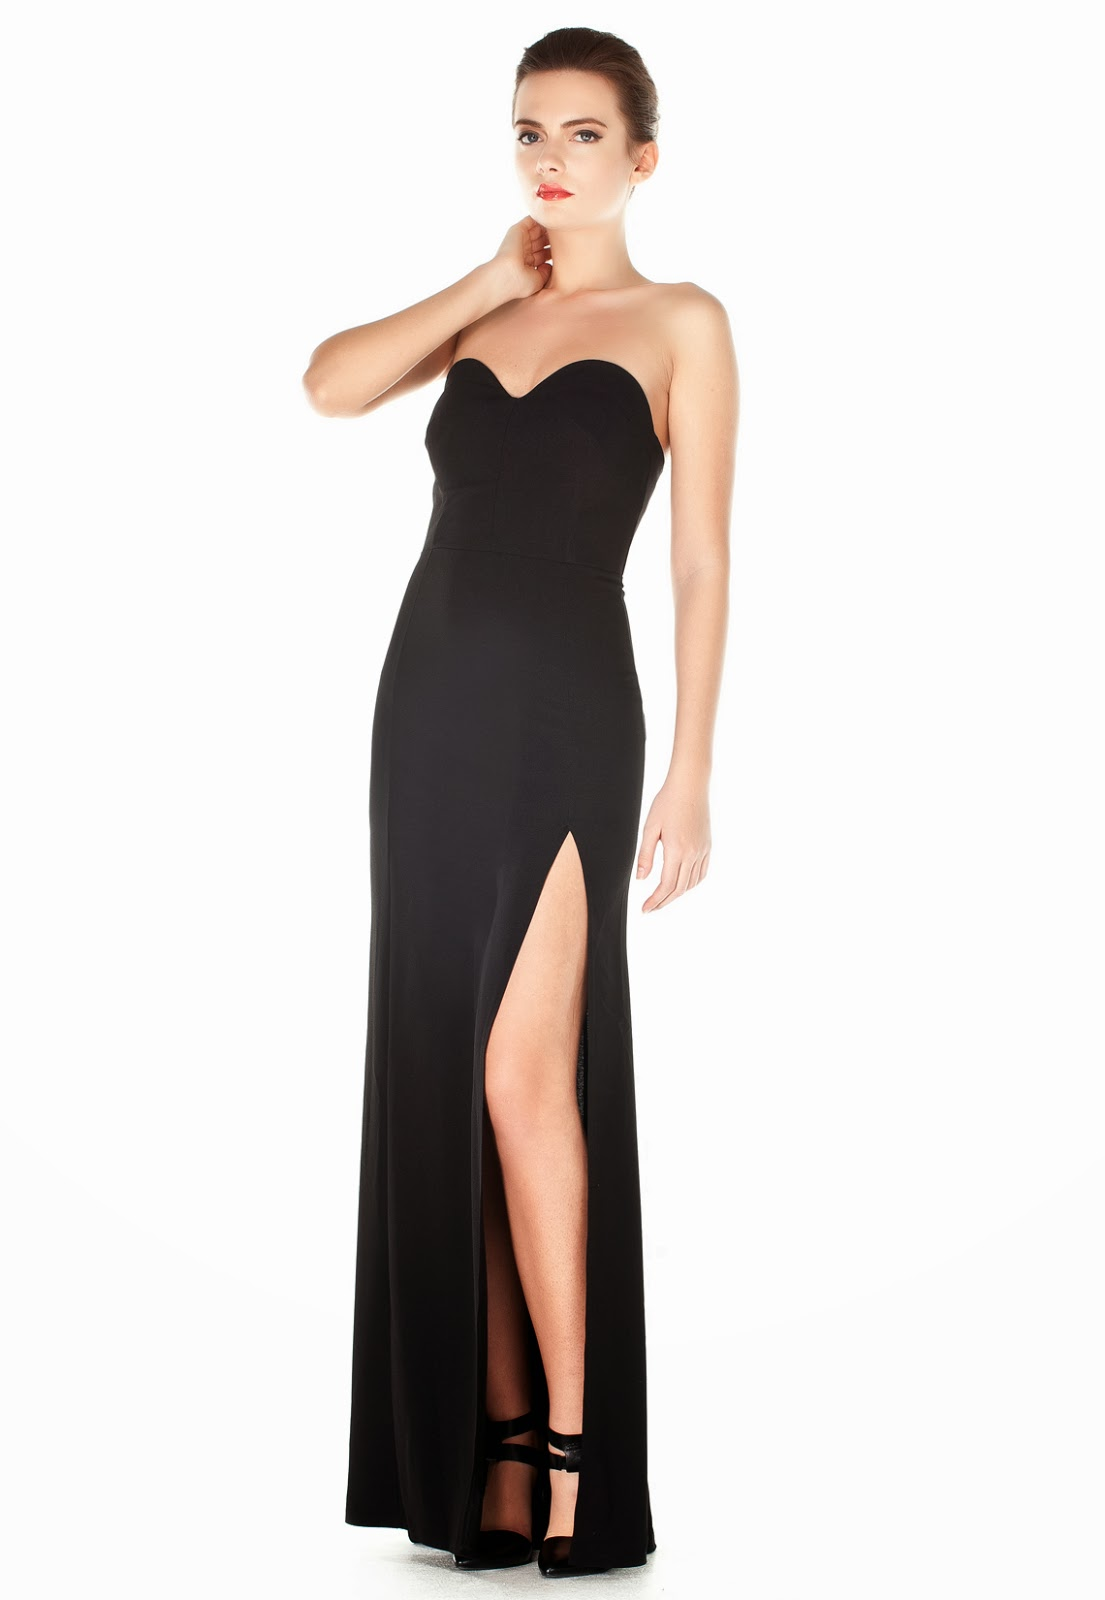 Siyah straplez elbise modelleri